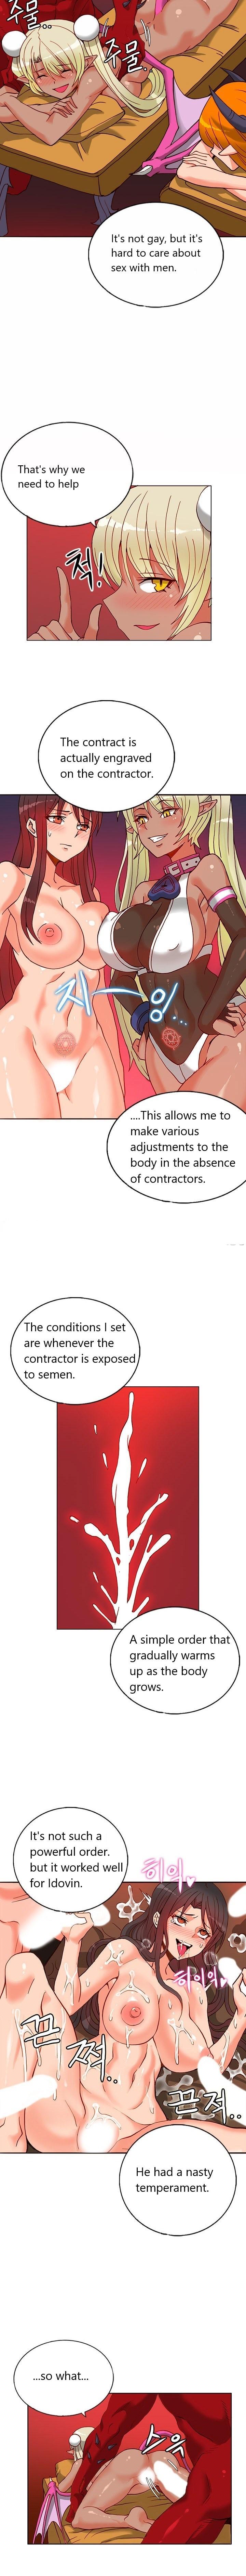 Johnson Contractor 124